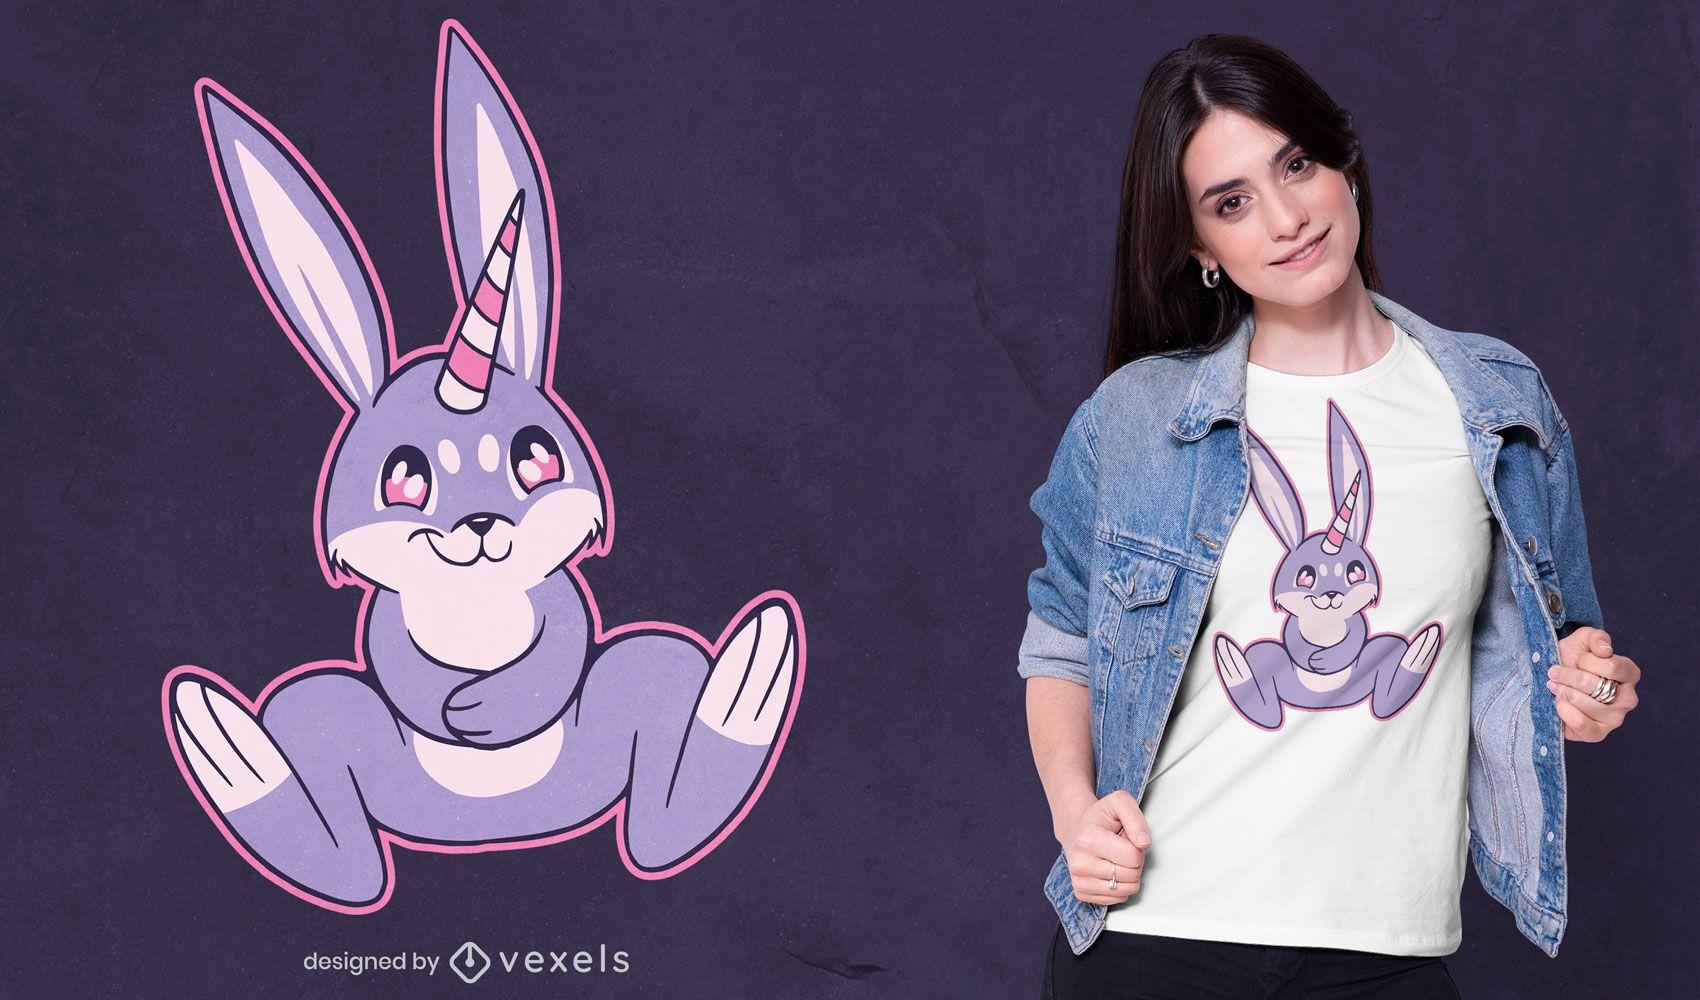 Dise?o de camiseta de cuerno de unicornio de conejito